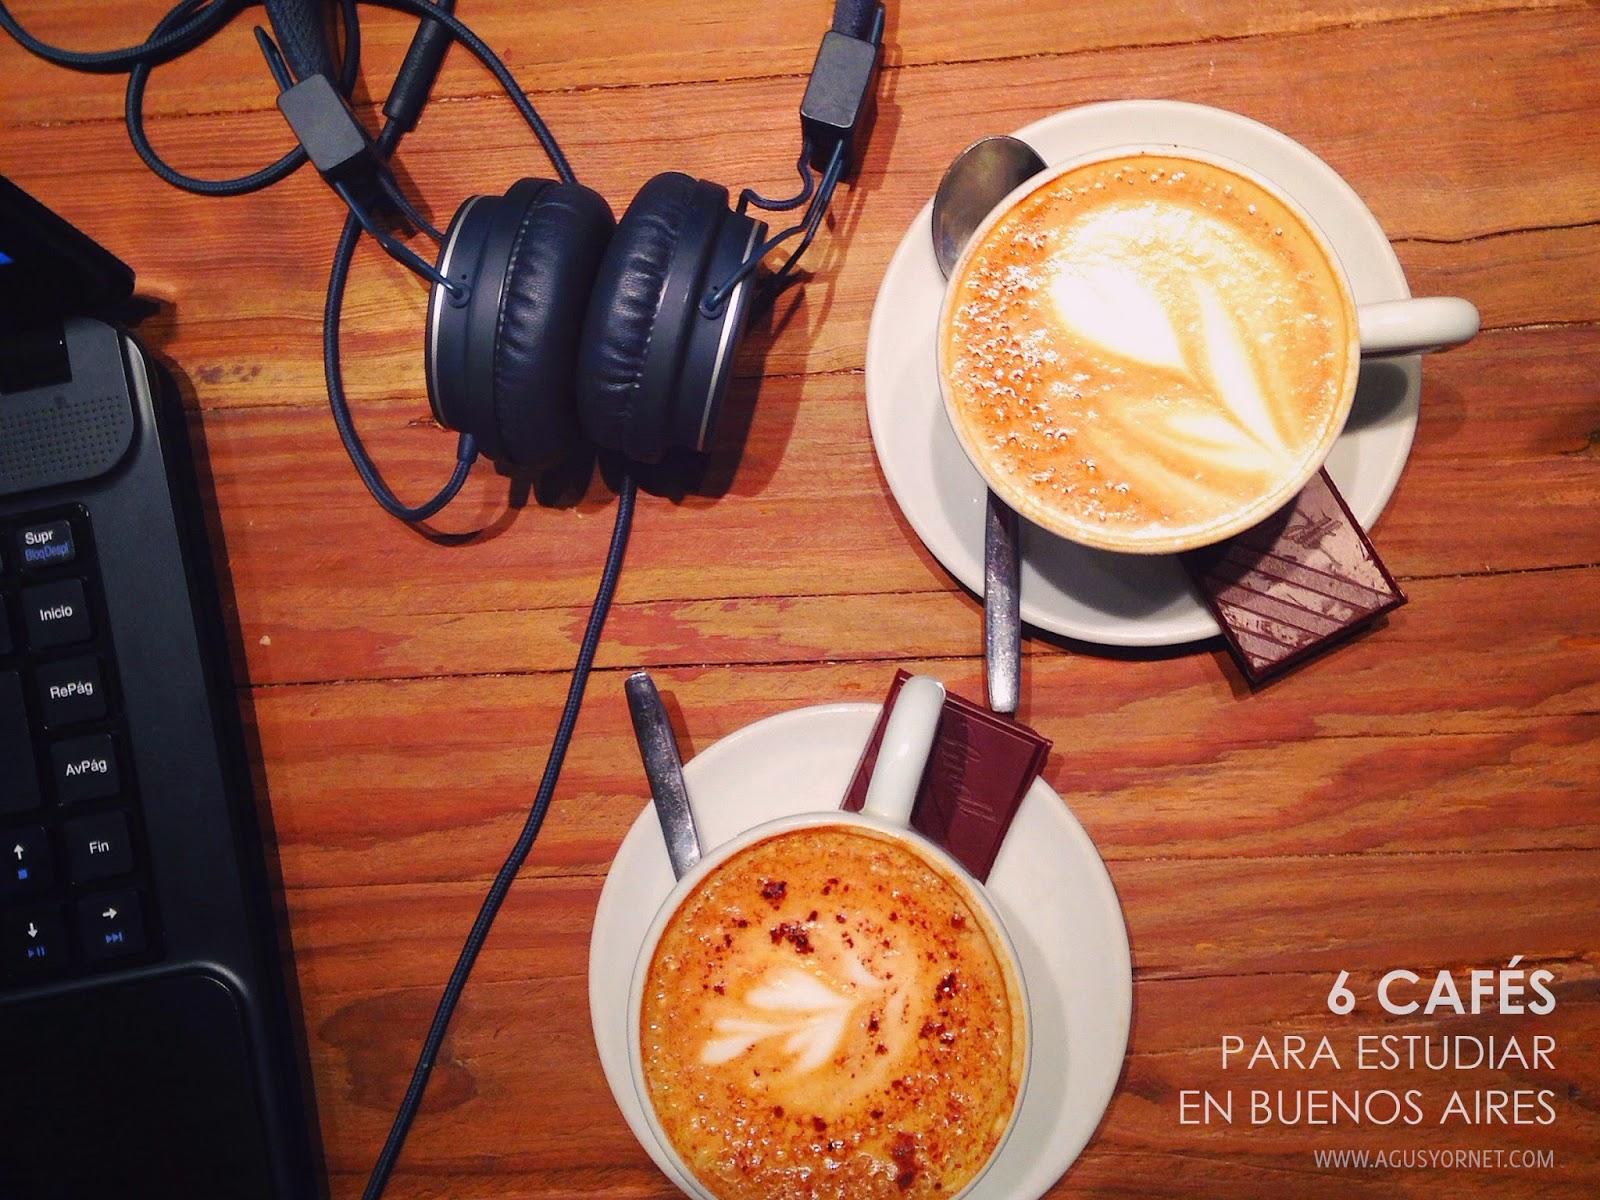 cafes para estudiar en buenos aires cafeterias